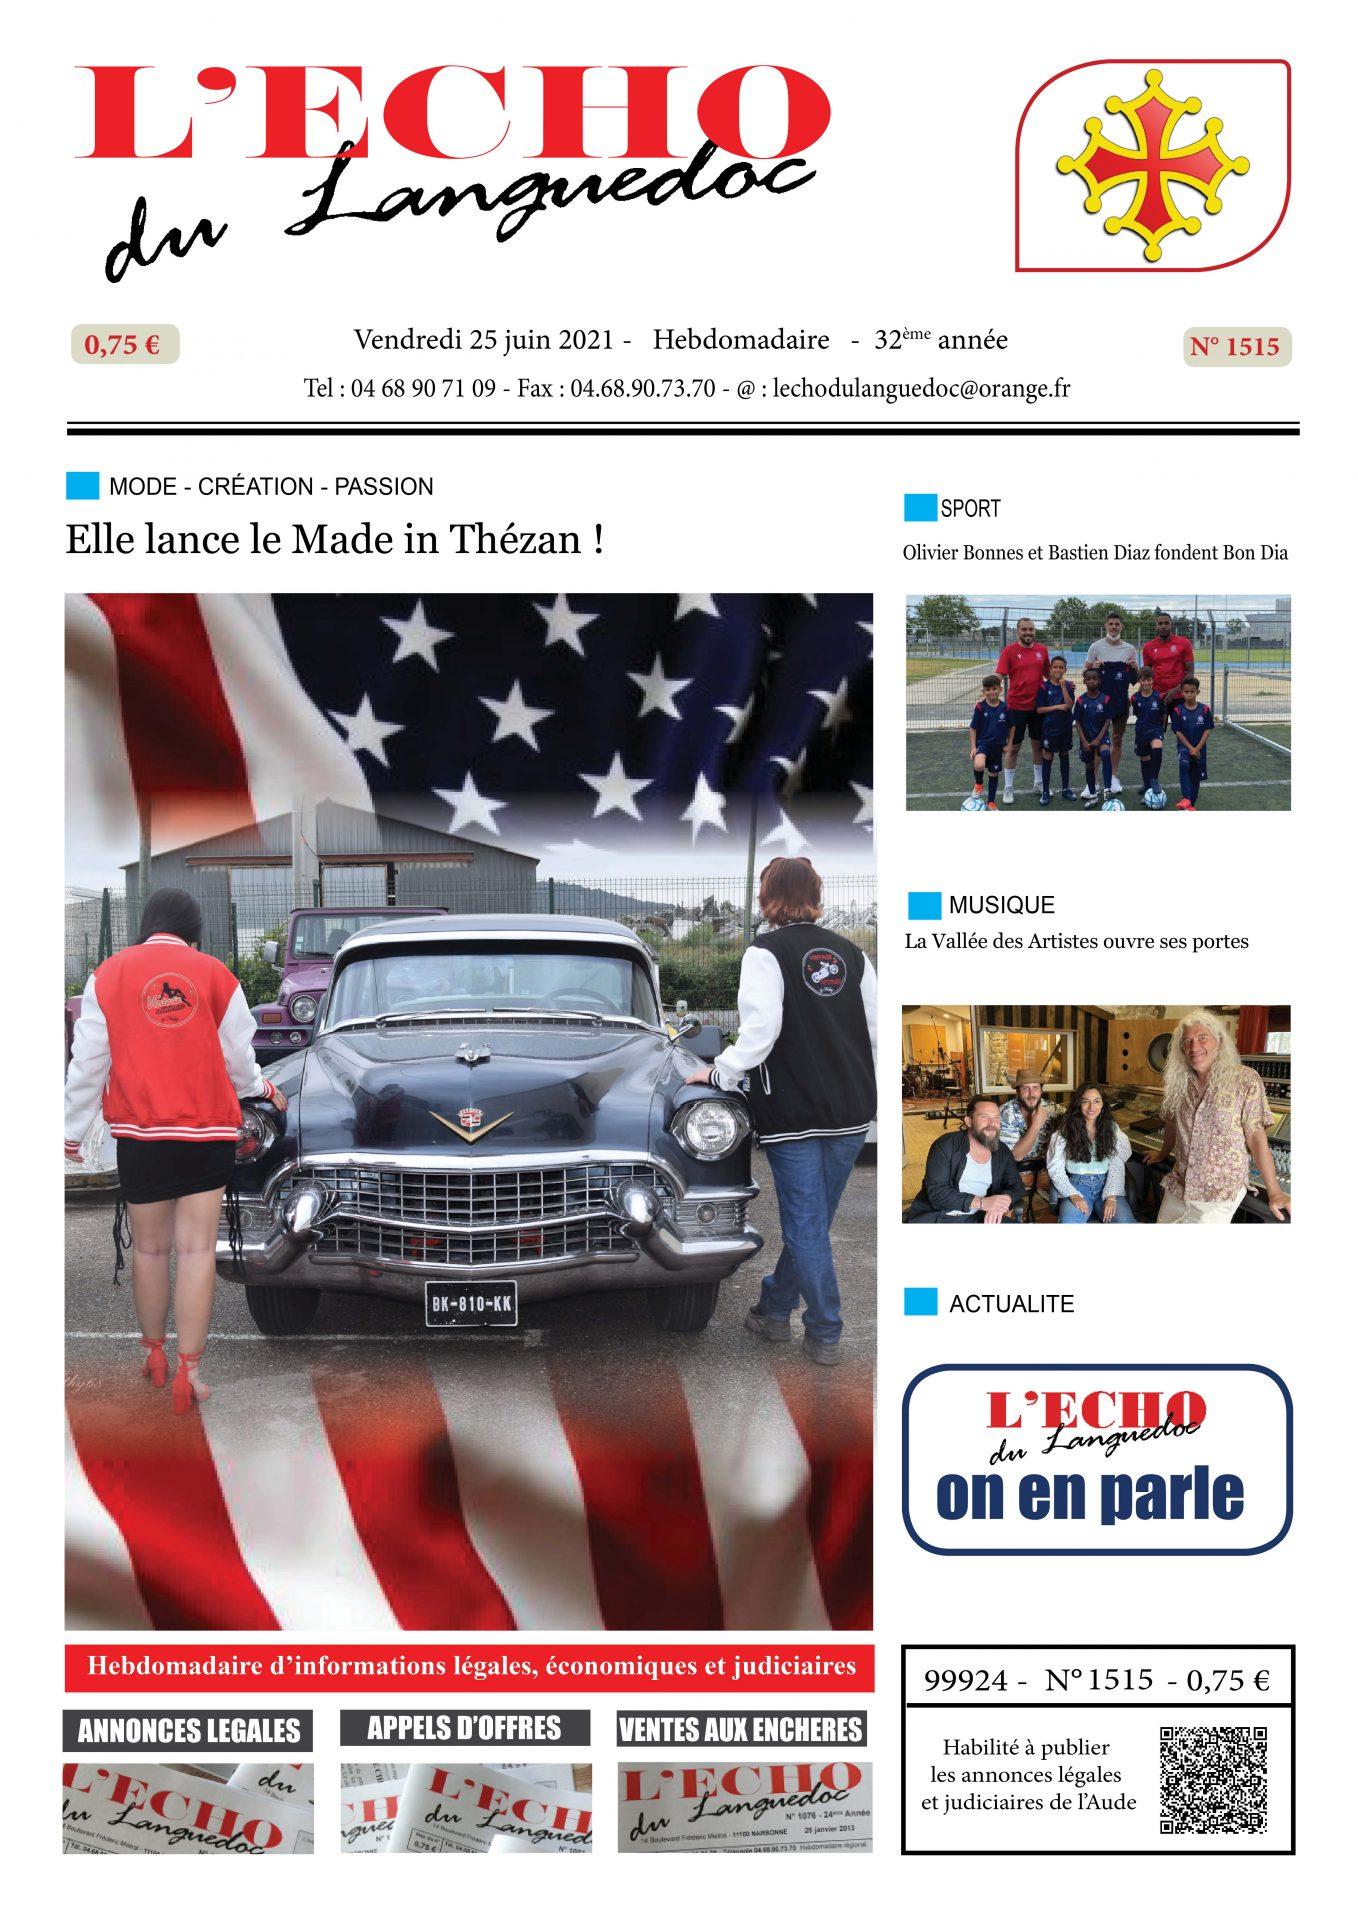 Journal n° 1515 du 25 juin 2021 - L'Echo du Languedoc